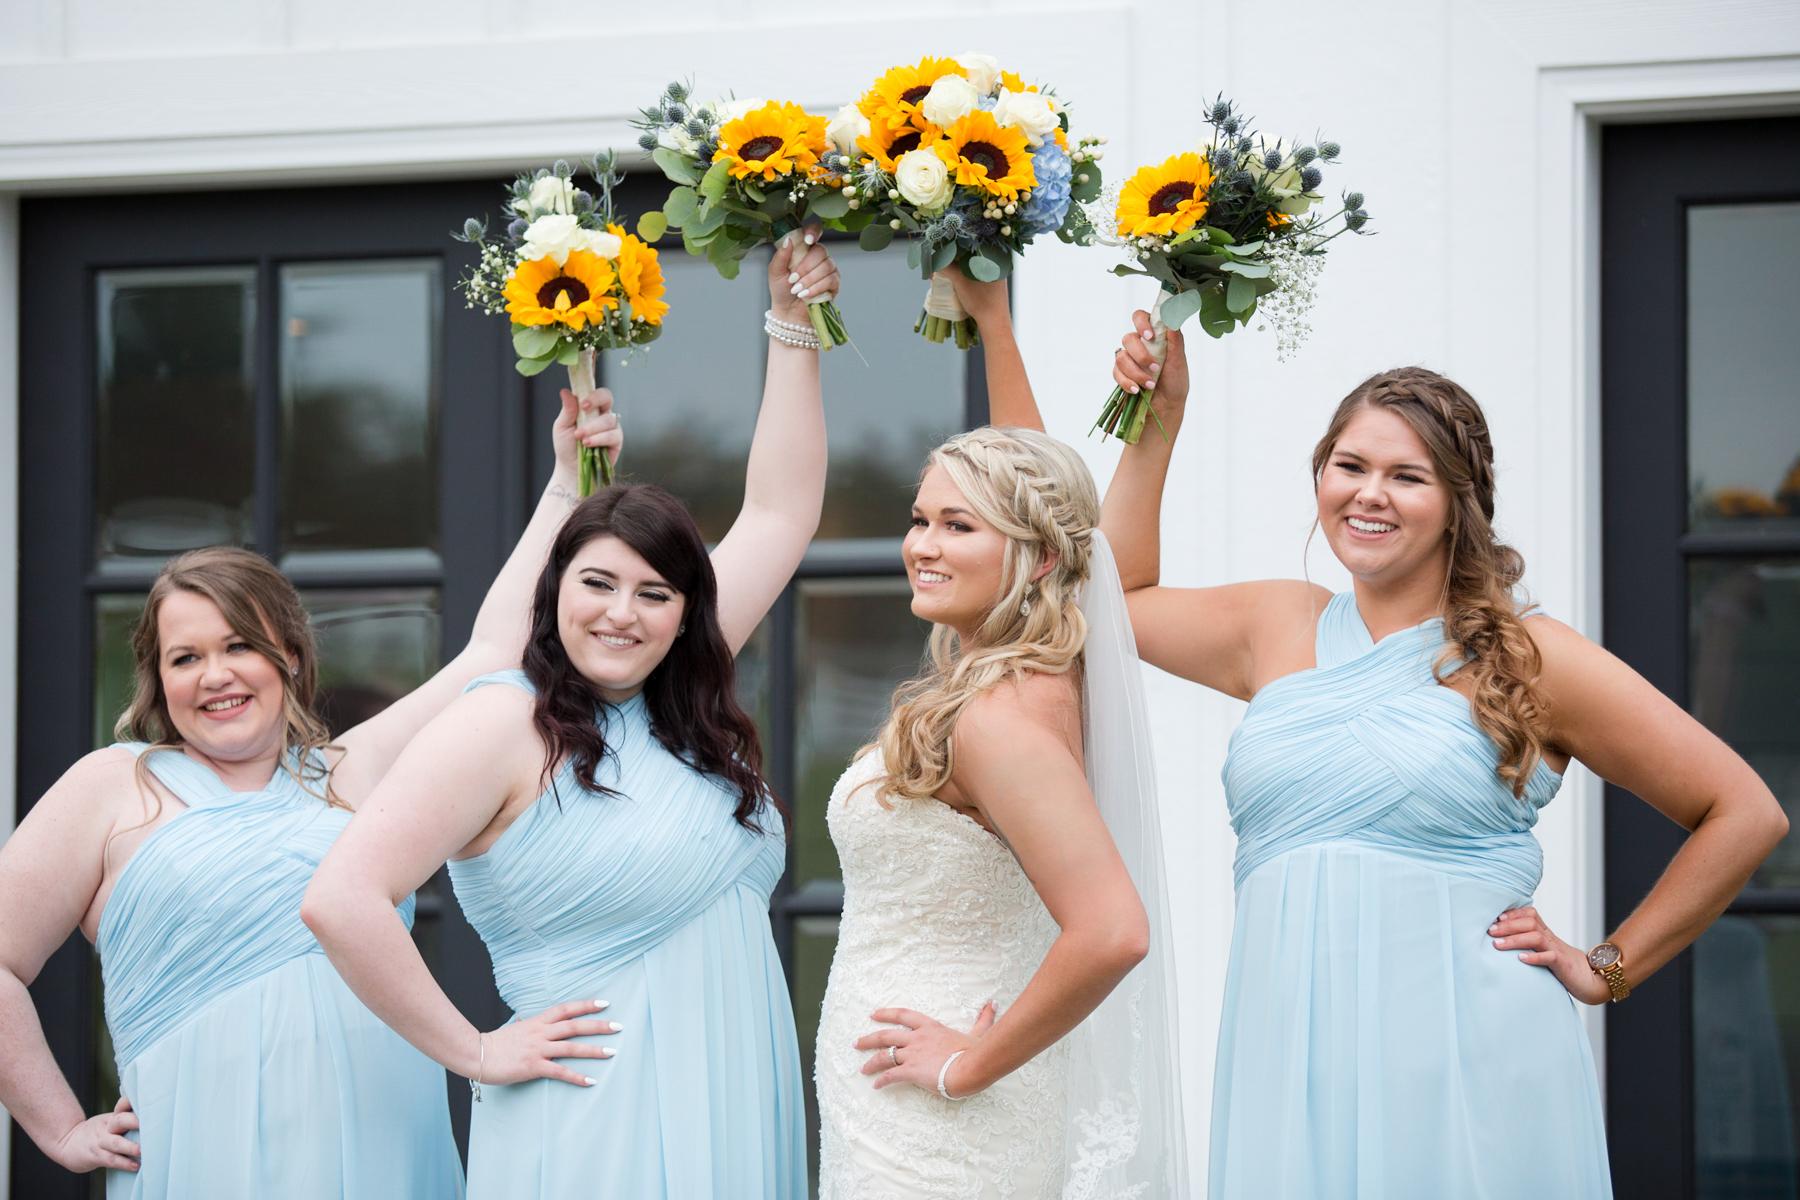 The-venue-at-white-oak-farms-wedding-nashville-wedding-photographers-0118.jpg